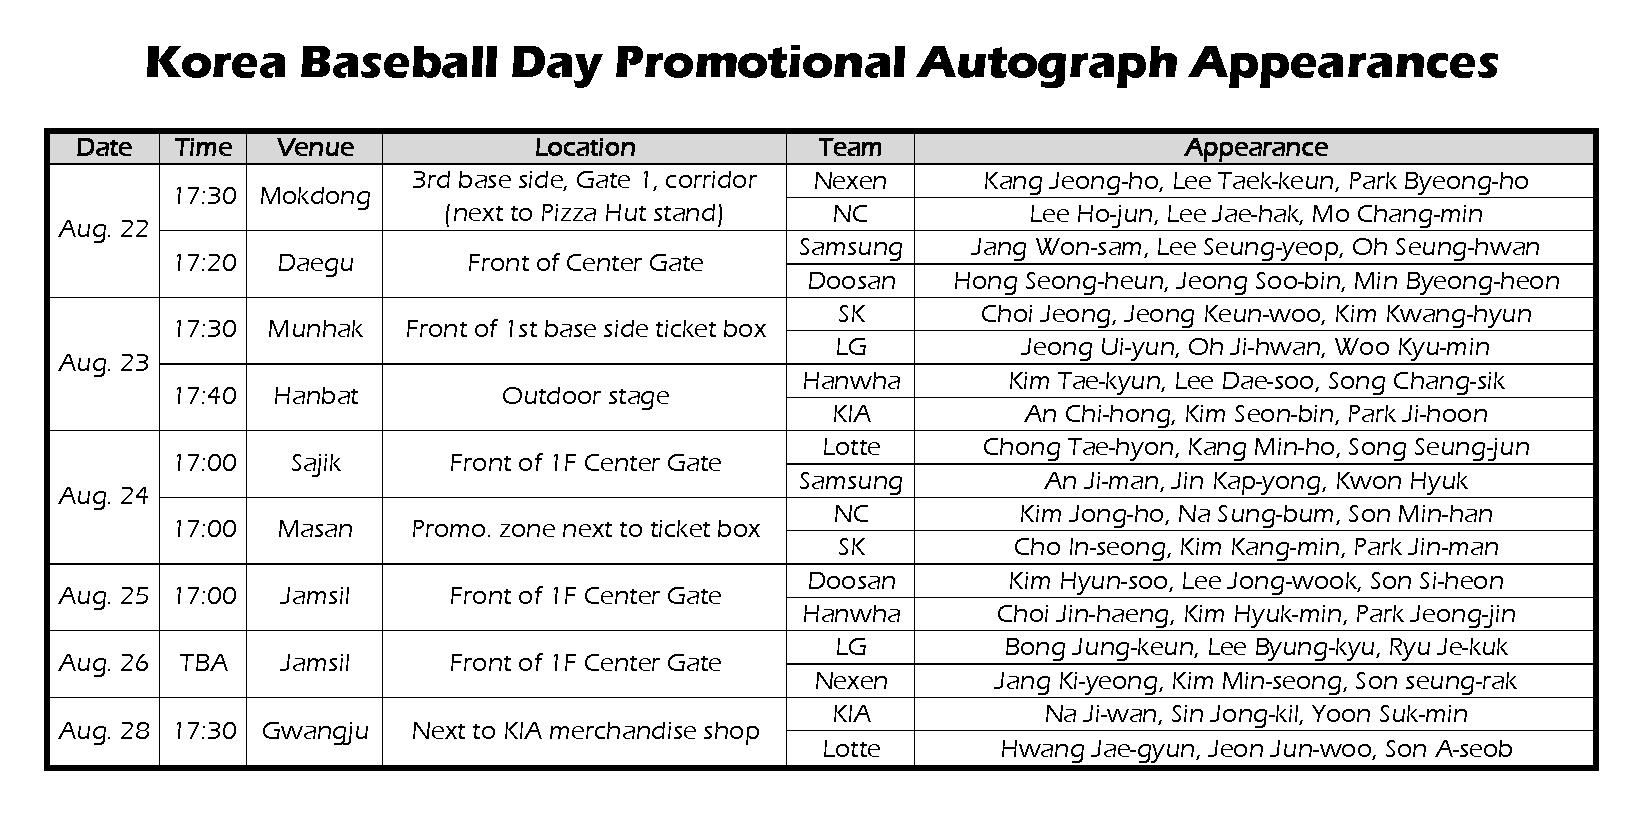 Autograph Appearance